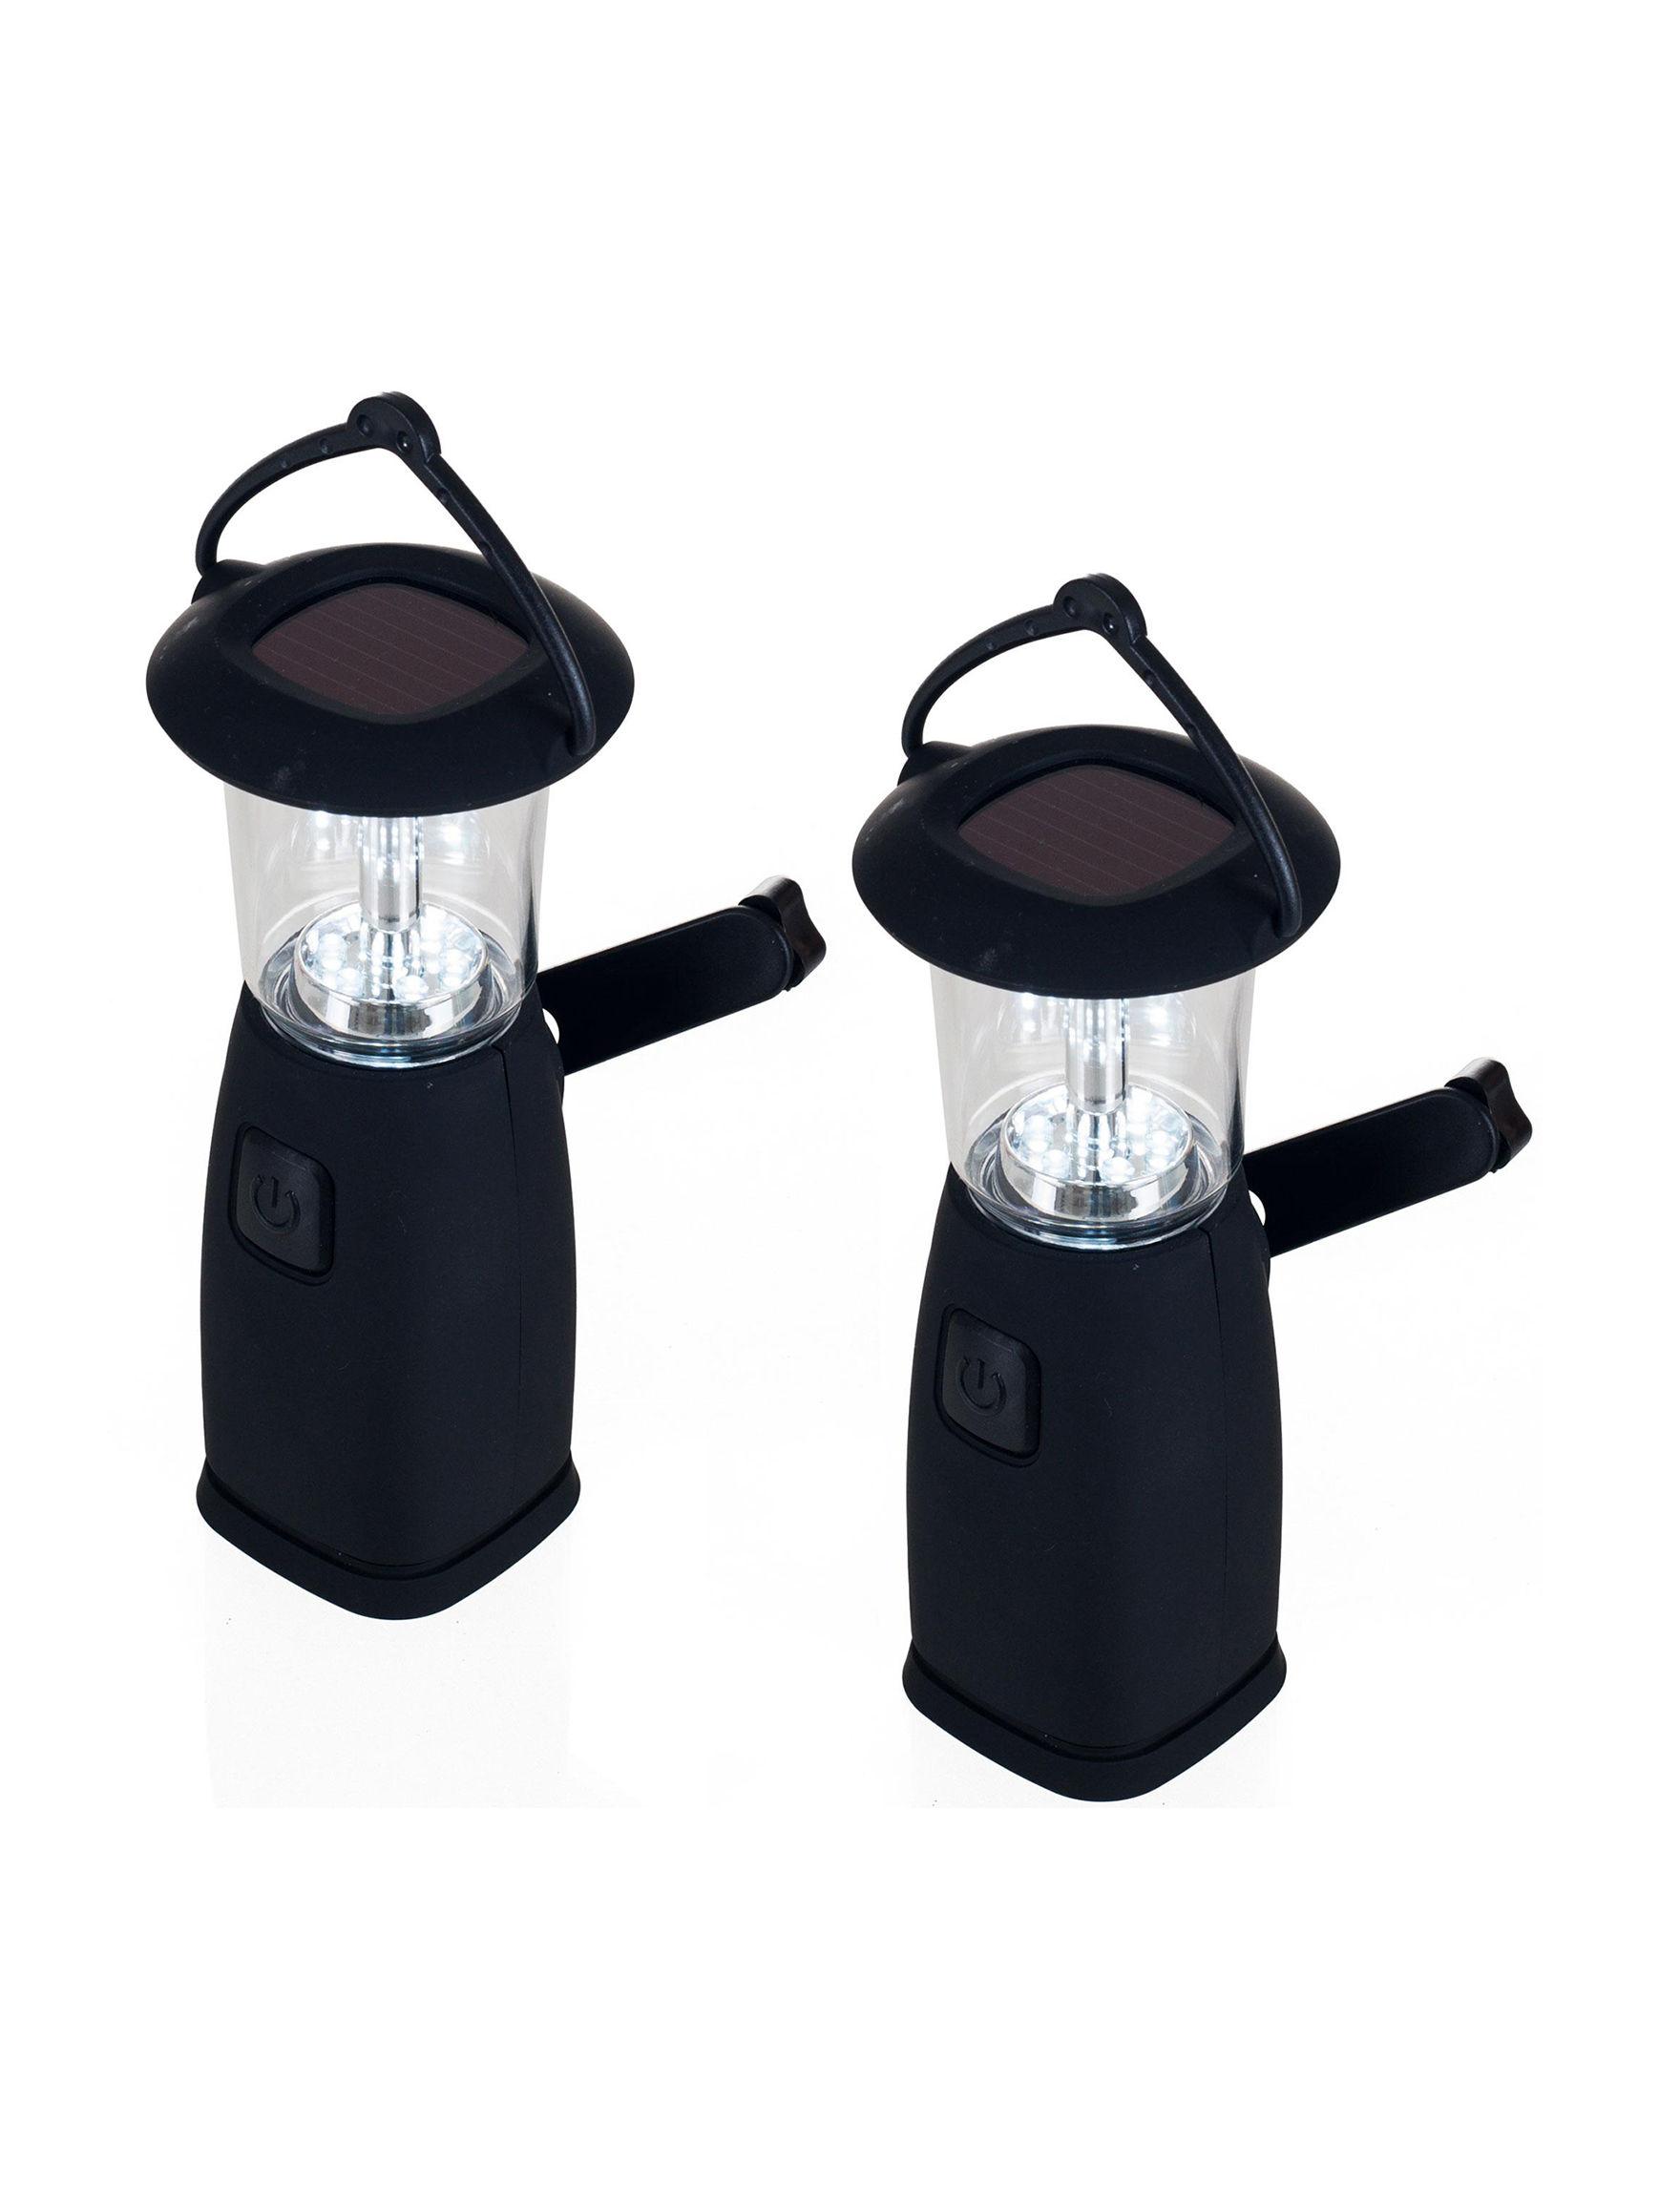 Whetstone Black Lights & Lanterns Camping & Outdoor Gear